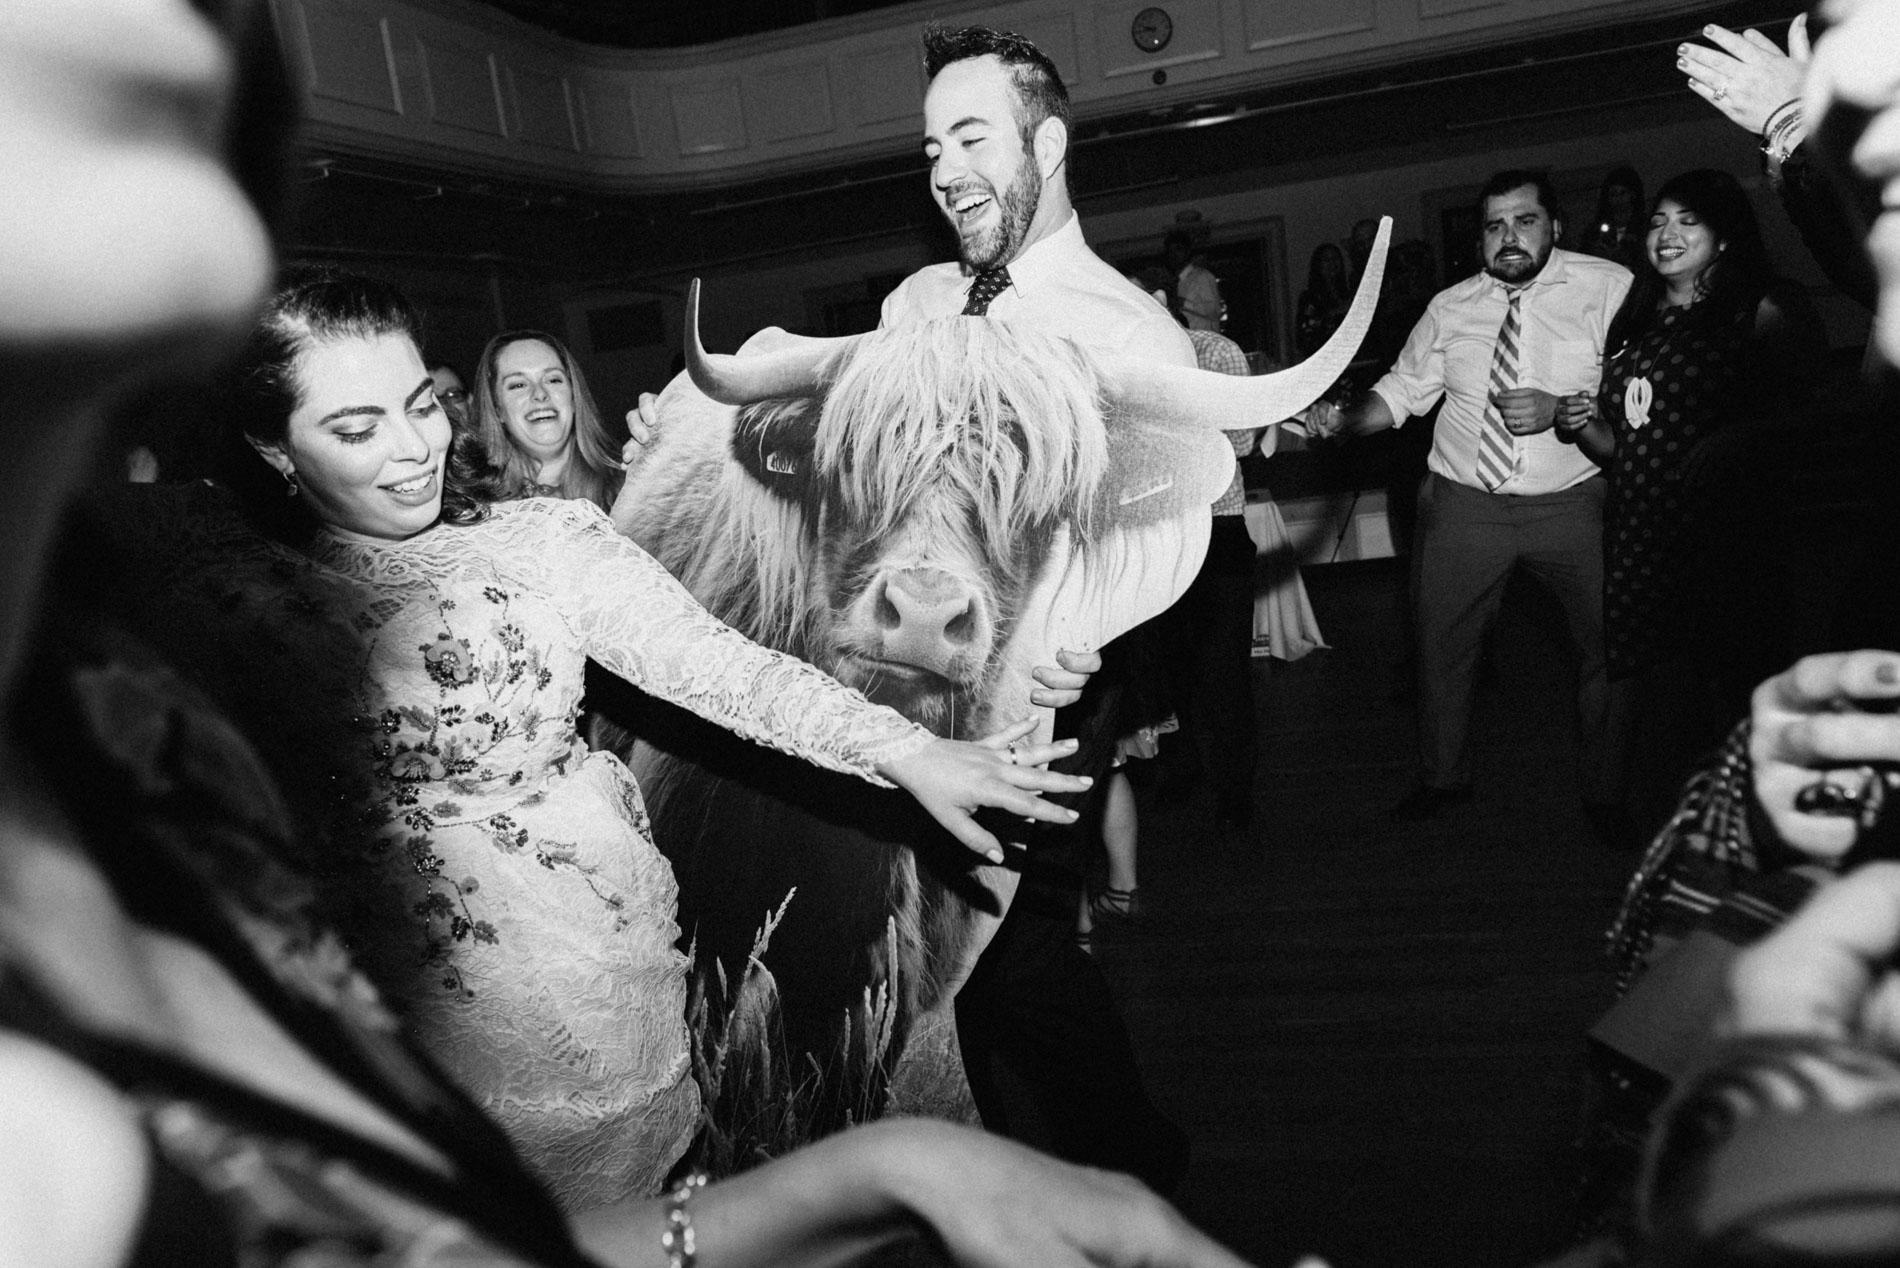 cow-cutout-boston-wedding-photographer-boston-wedding-irish-themed-wedding-boston-acorn-street-engagement-destination-wedding-photographer-traveling-wedding-photographer-ireland-wedding-photographer